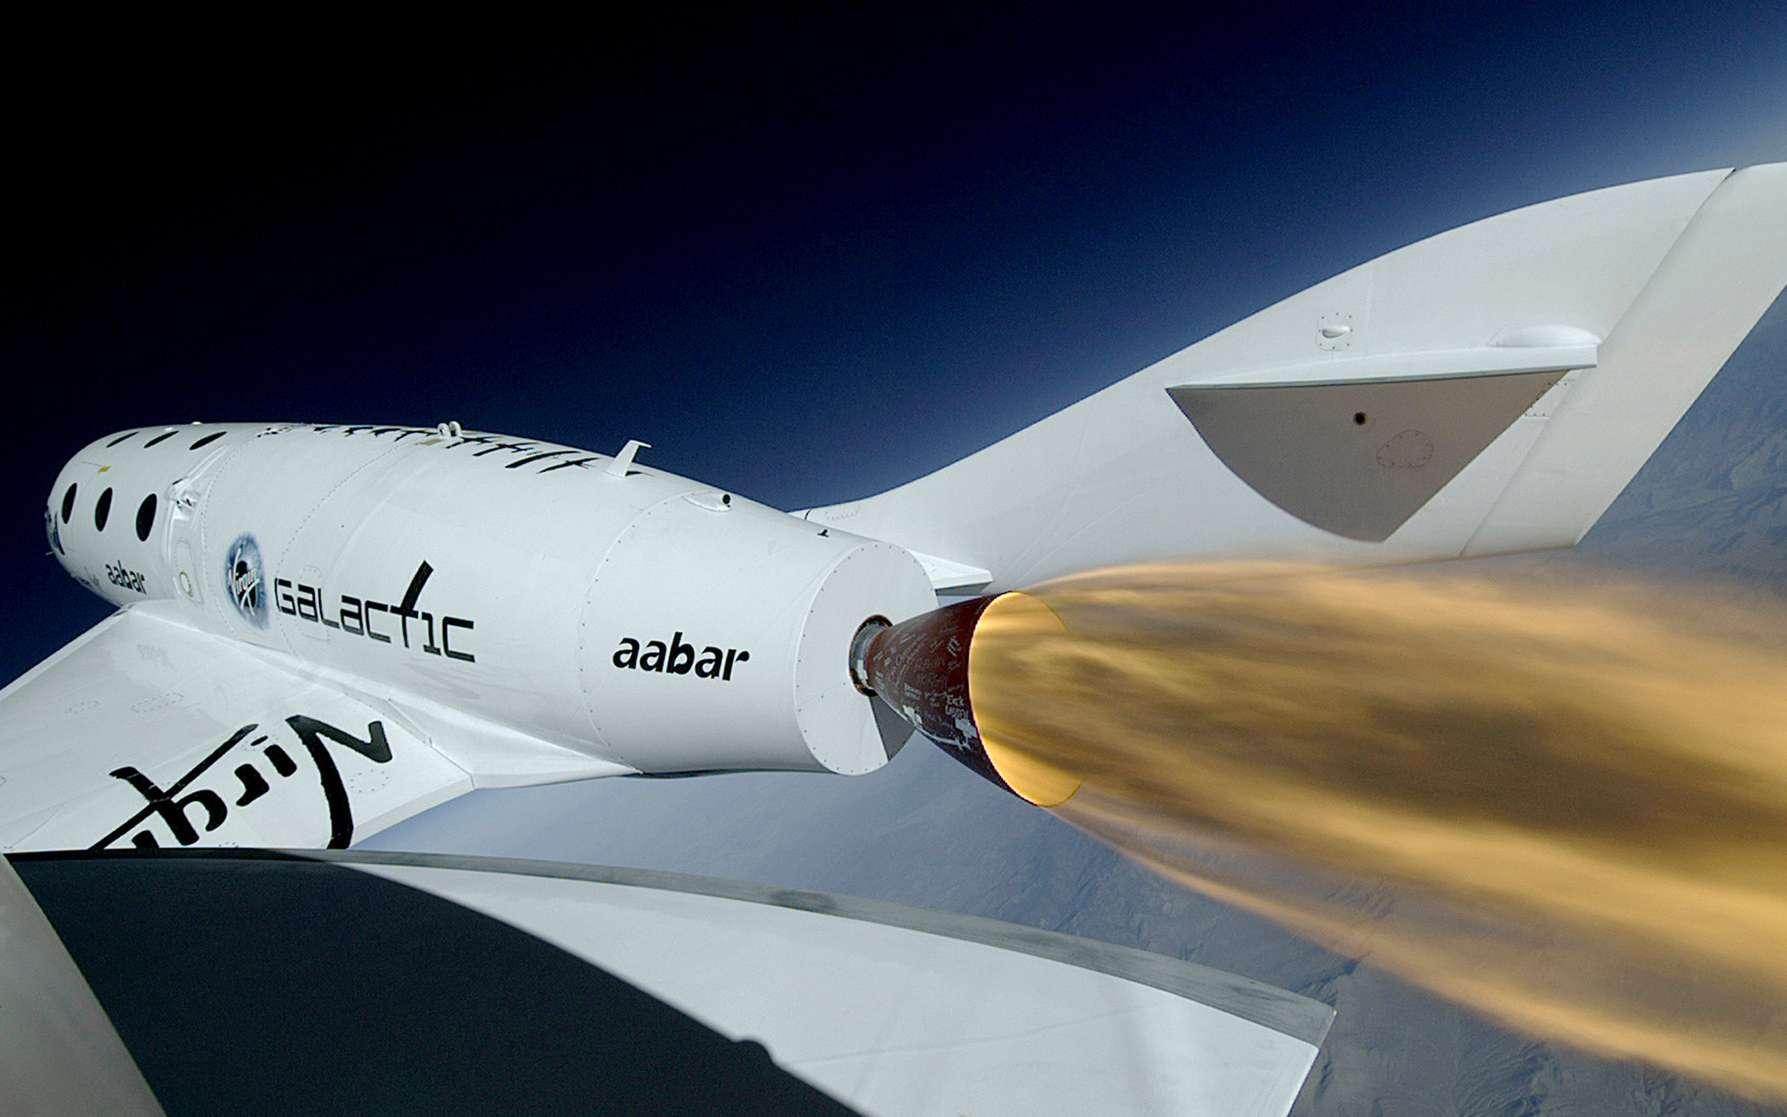 Espace: Virgin Galactic interdit de vol suborbital le temps d'une enquête de la FAA